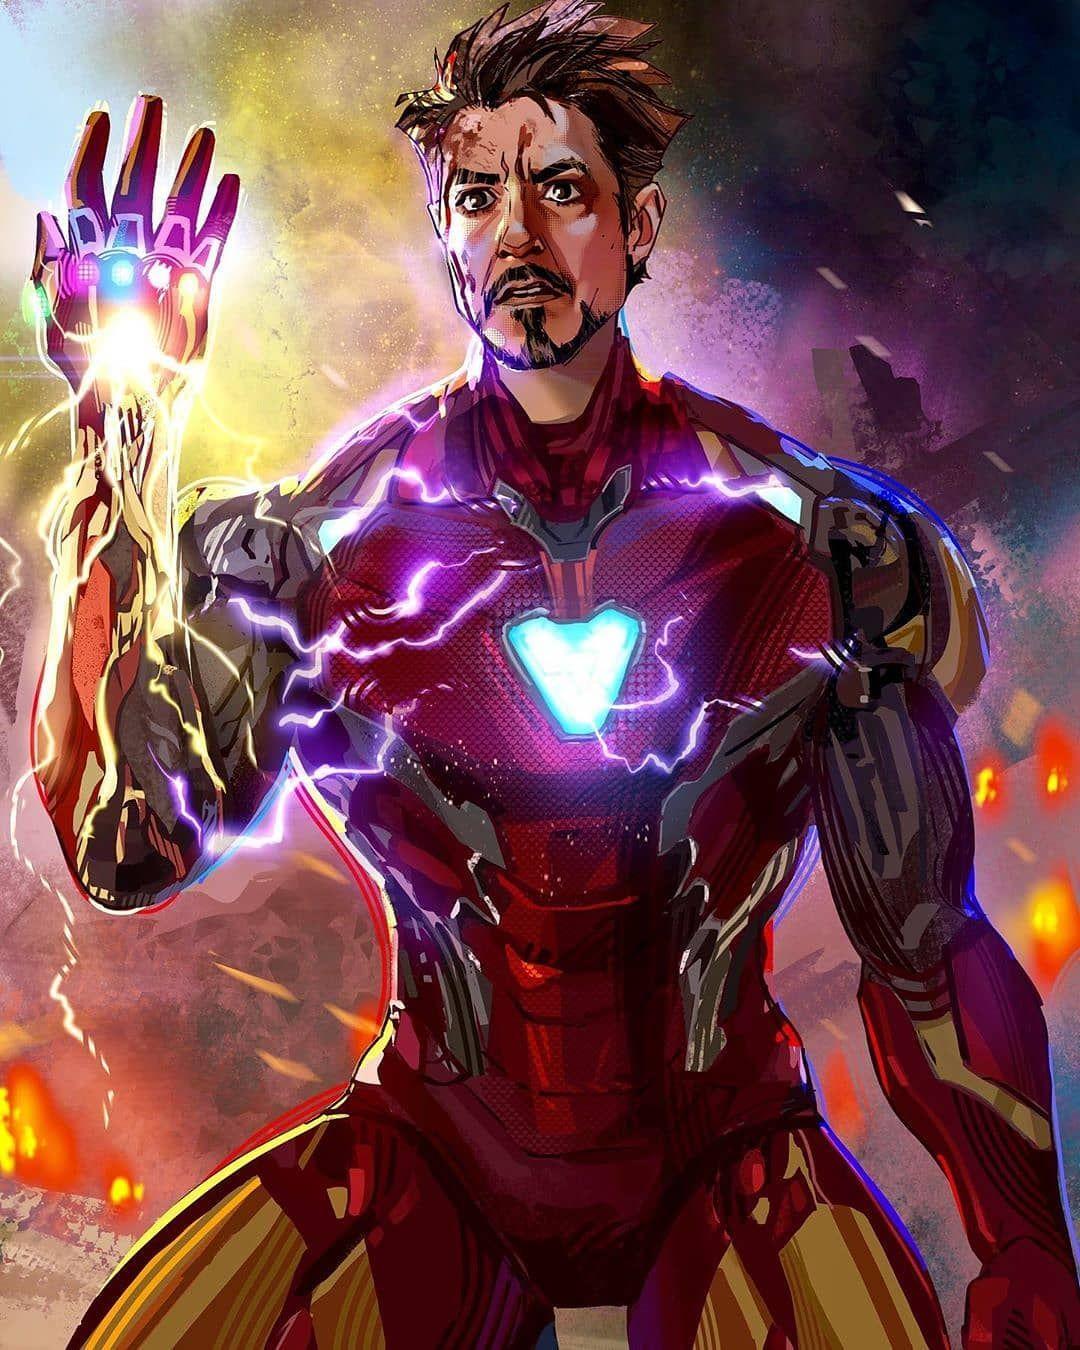 Marvel In 2020 Iron Man Poster Iron Man Comic Iron Man Artwork